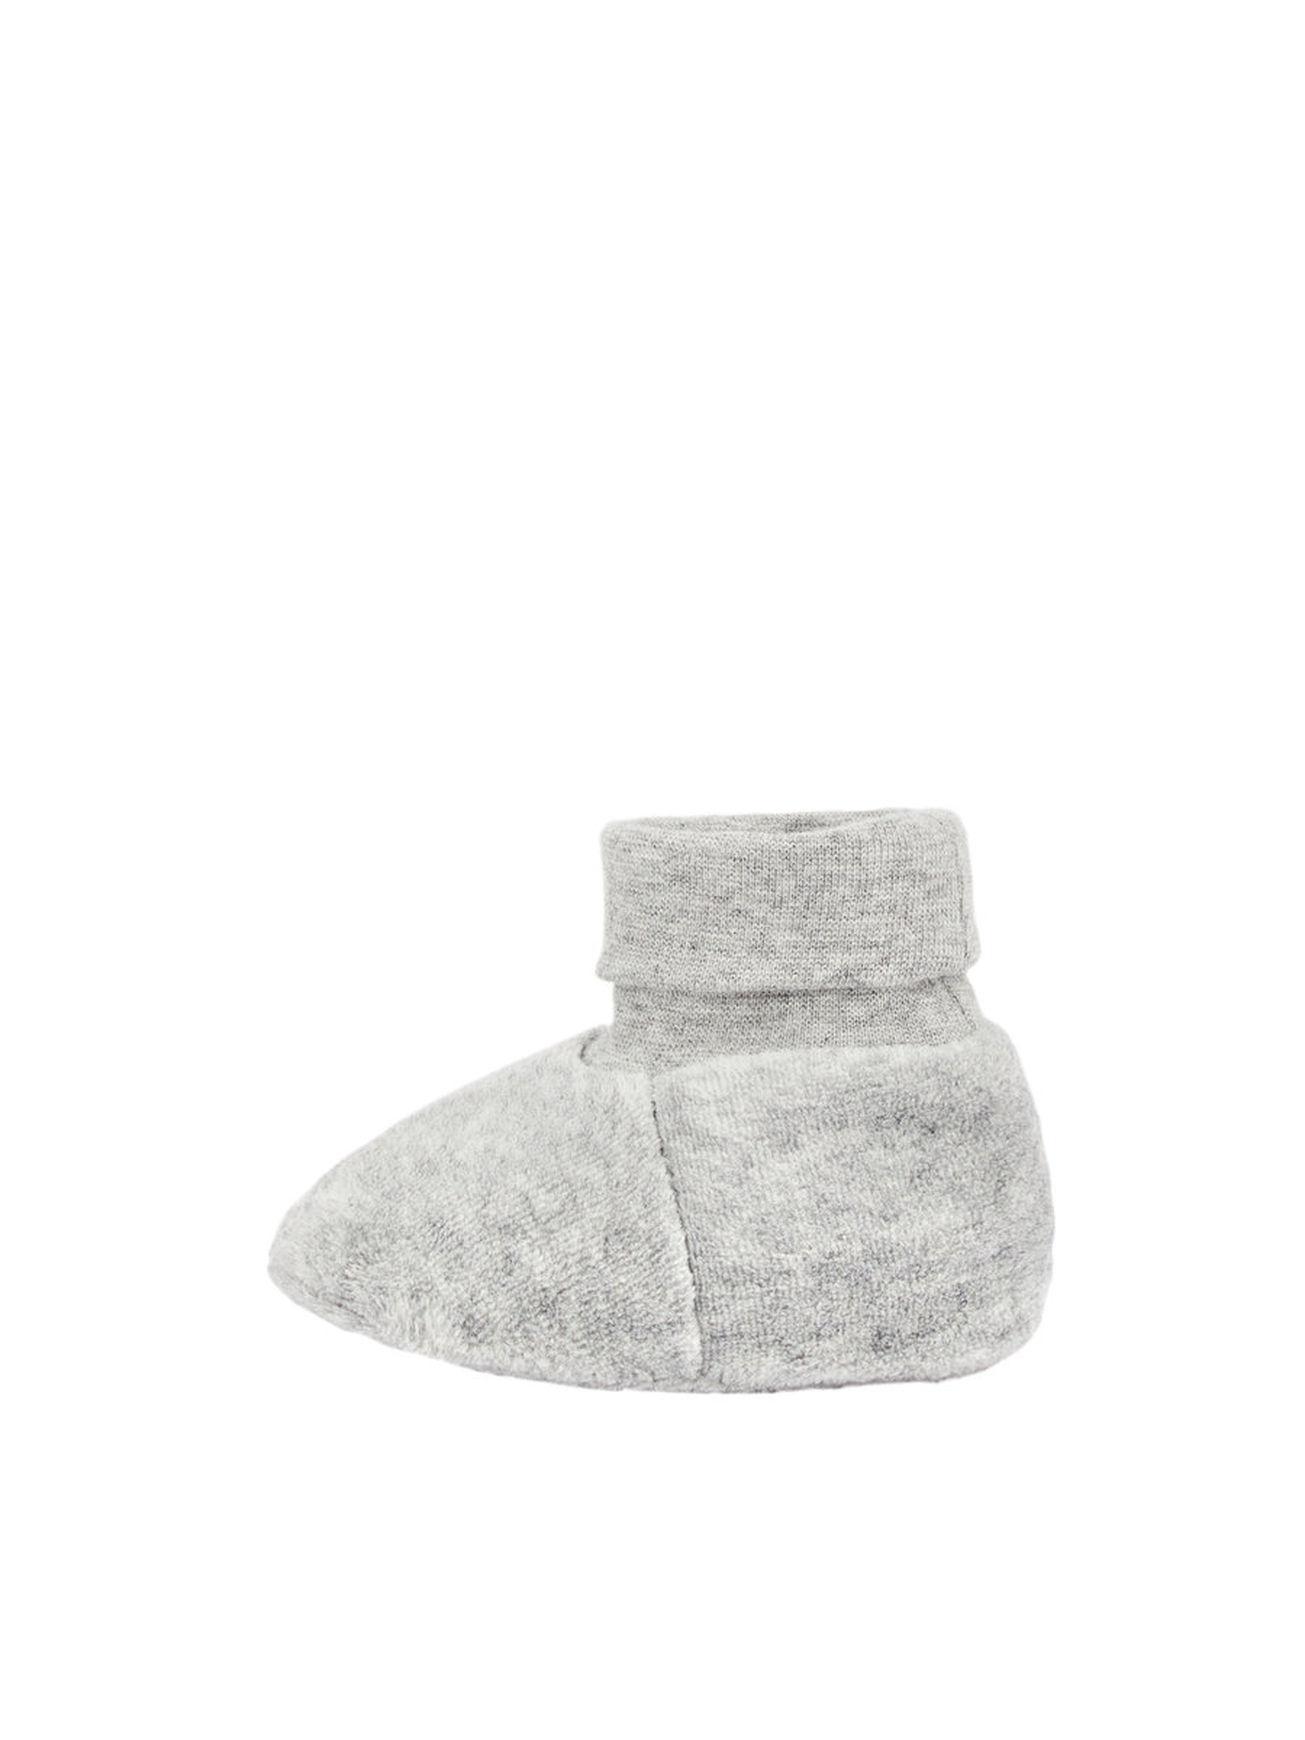 NAME IT NBNUNNELA VEL SLIPPERS Grey Melange 50/56 - NAME IT